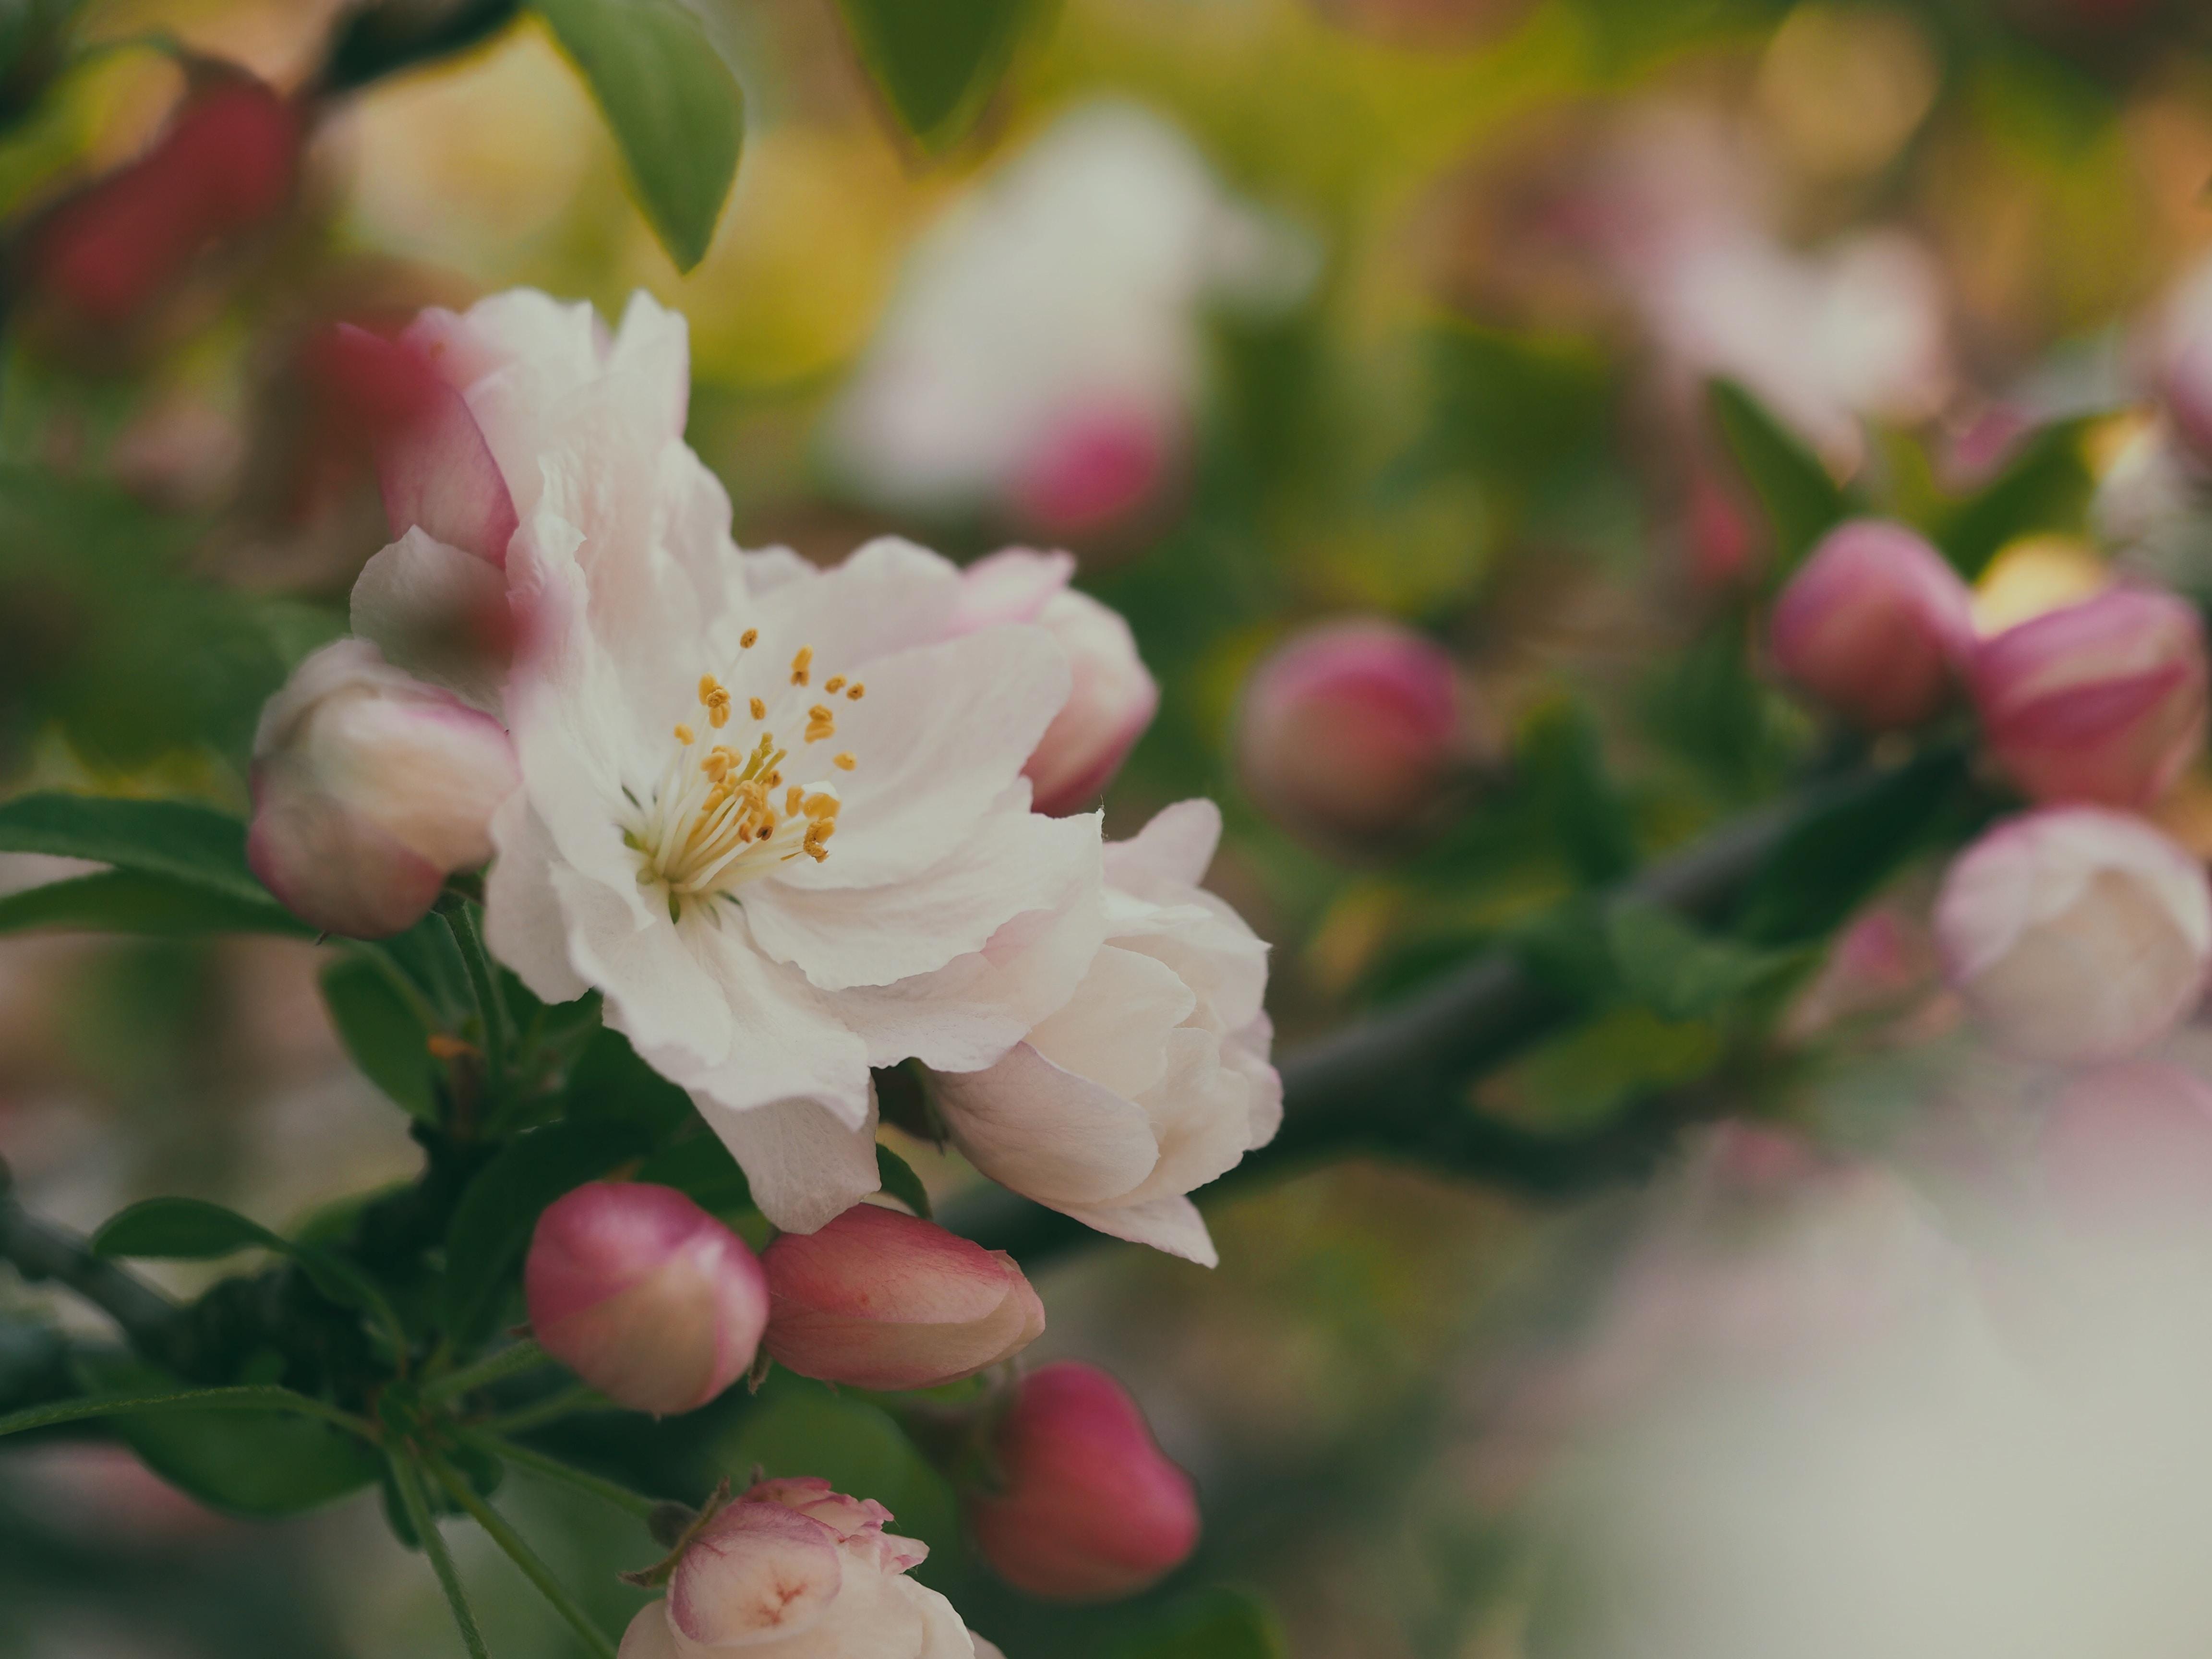 A macro shot of a white flower.